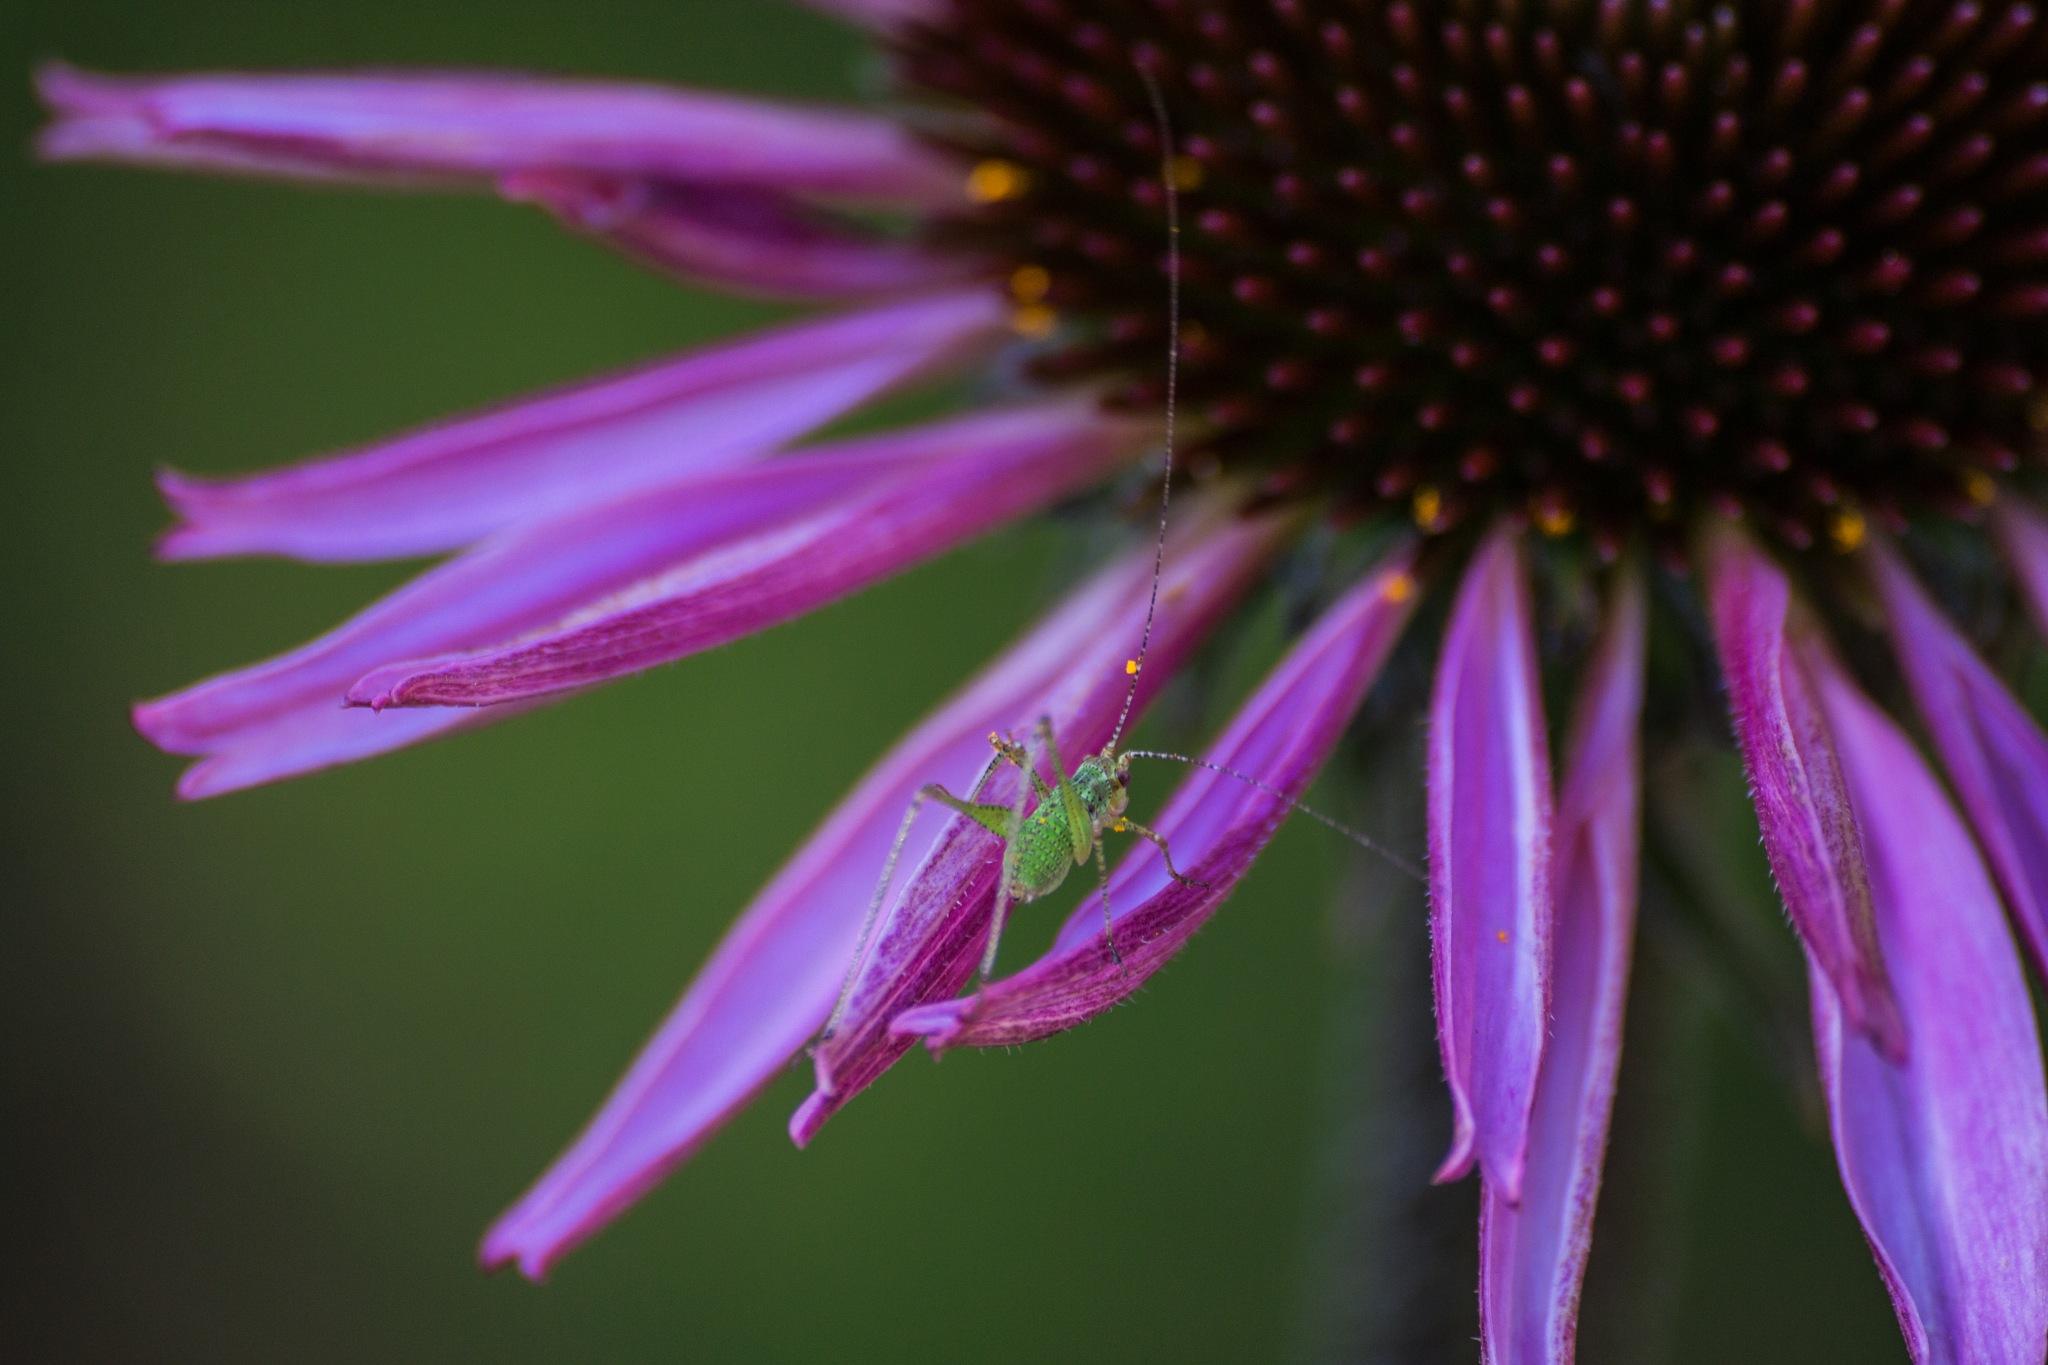 Grasshopper by Asma Ahmed